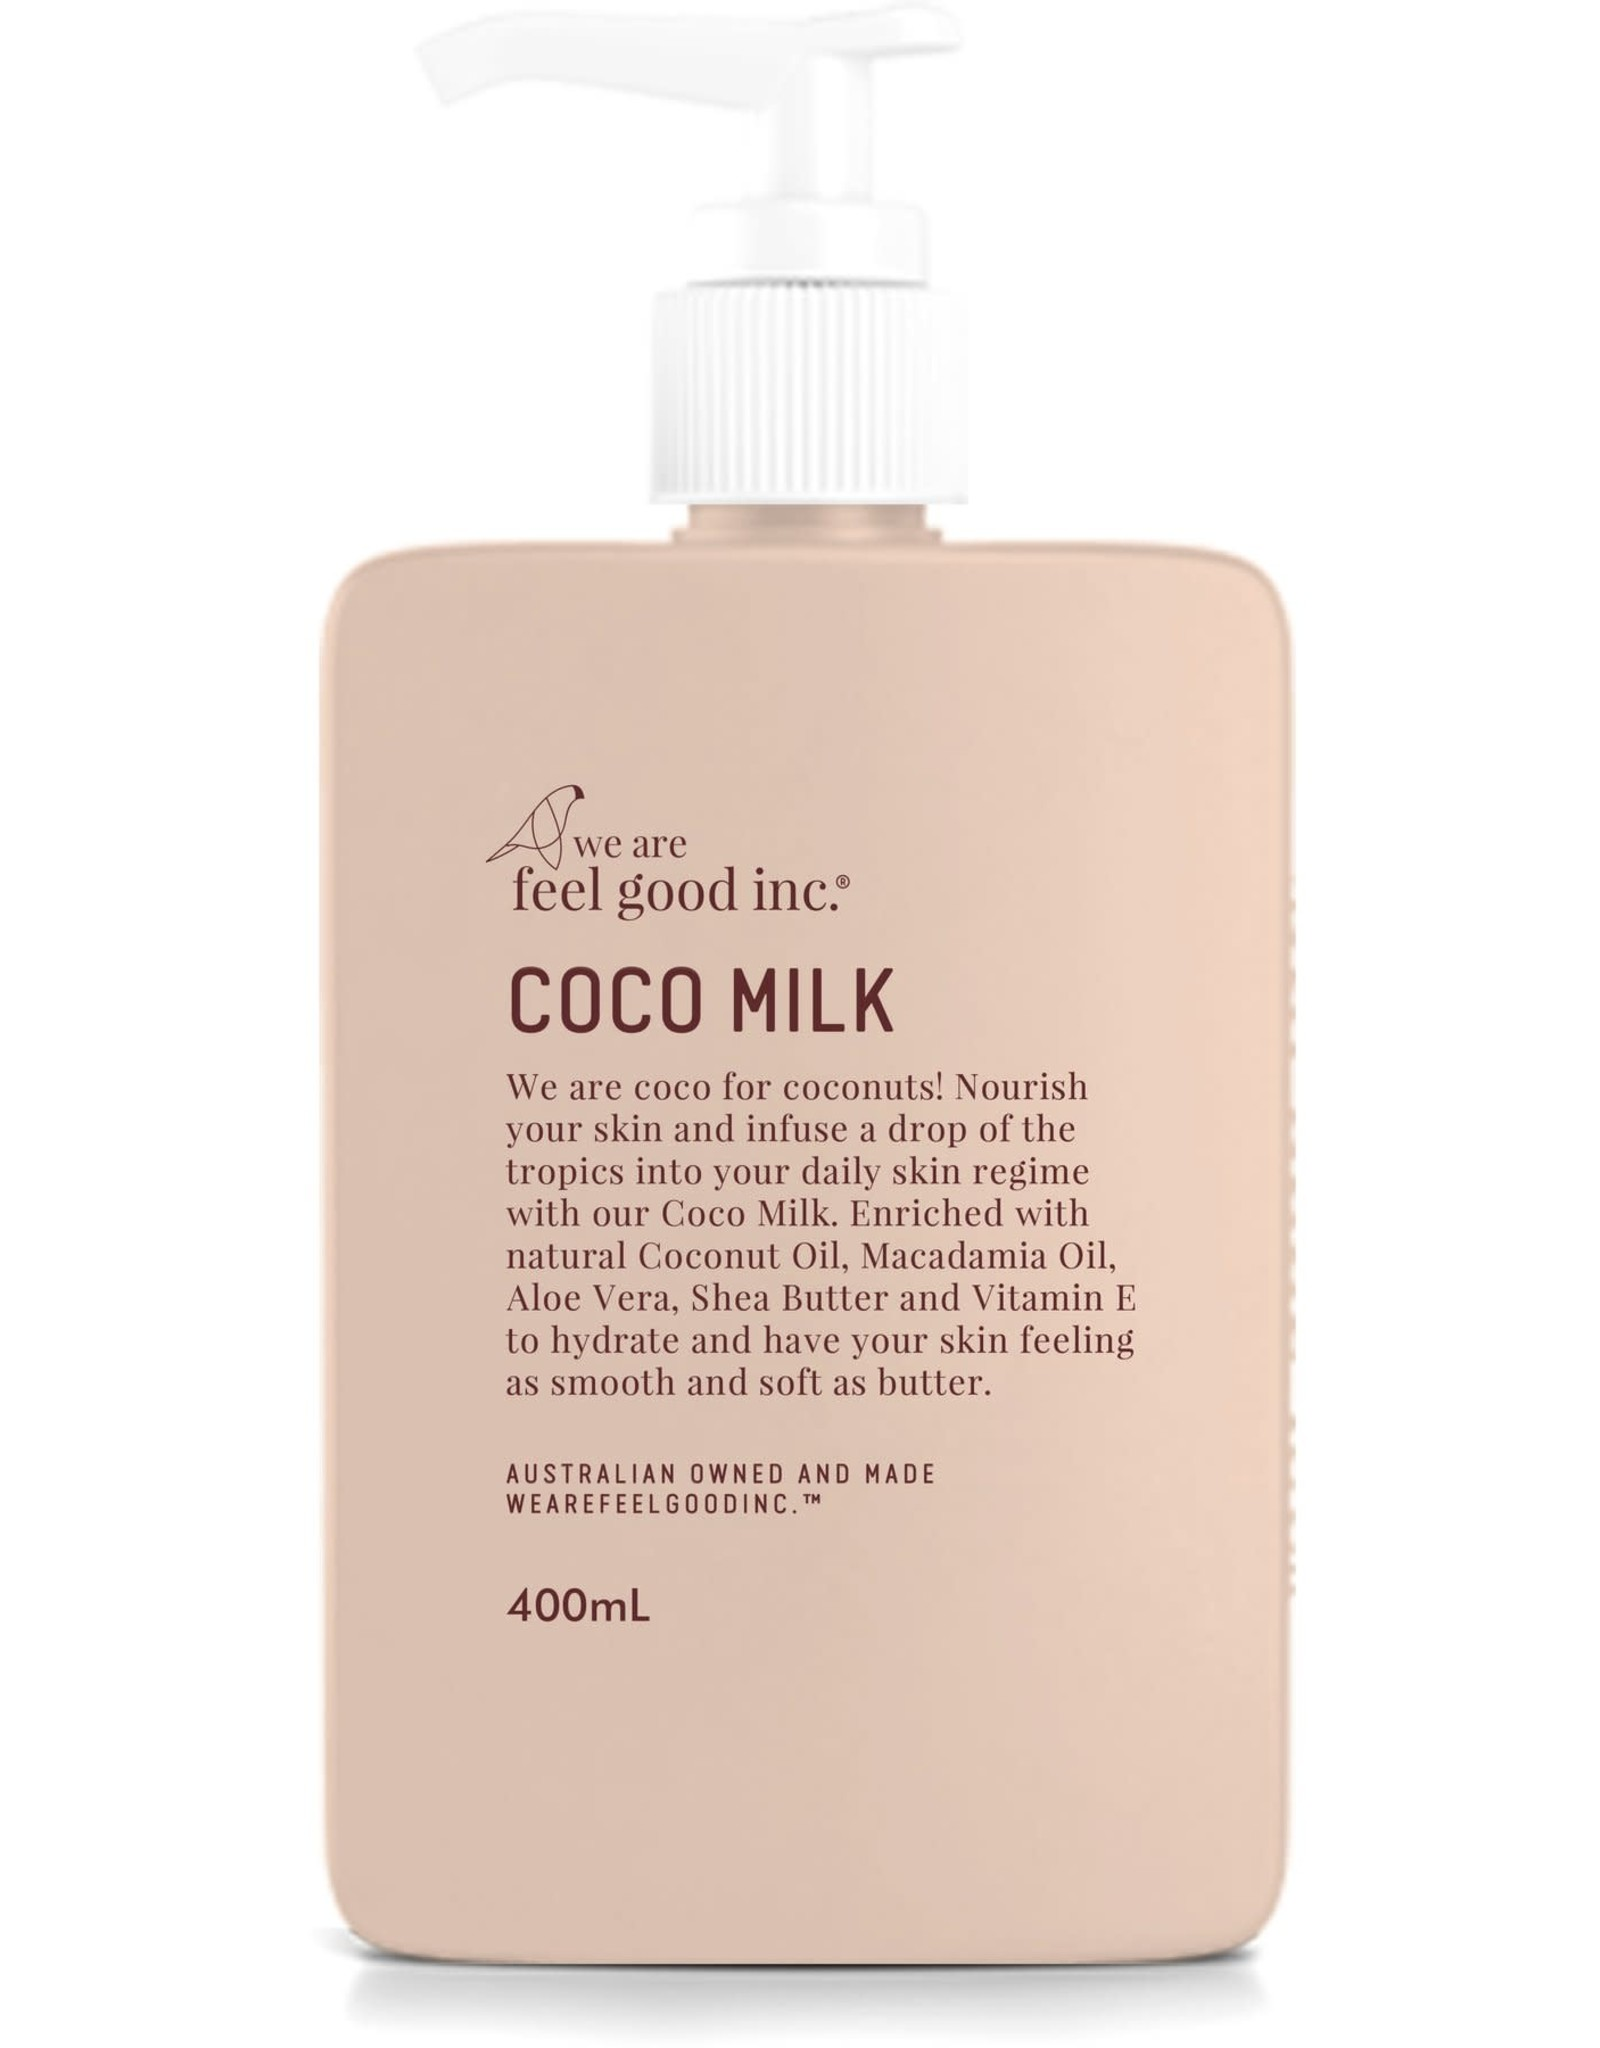 WE ARE FEEL GOOD INC Coco Milk Coconut Moisturiser 400ml